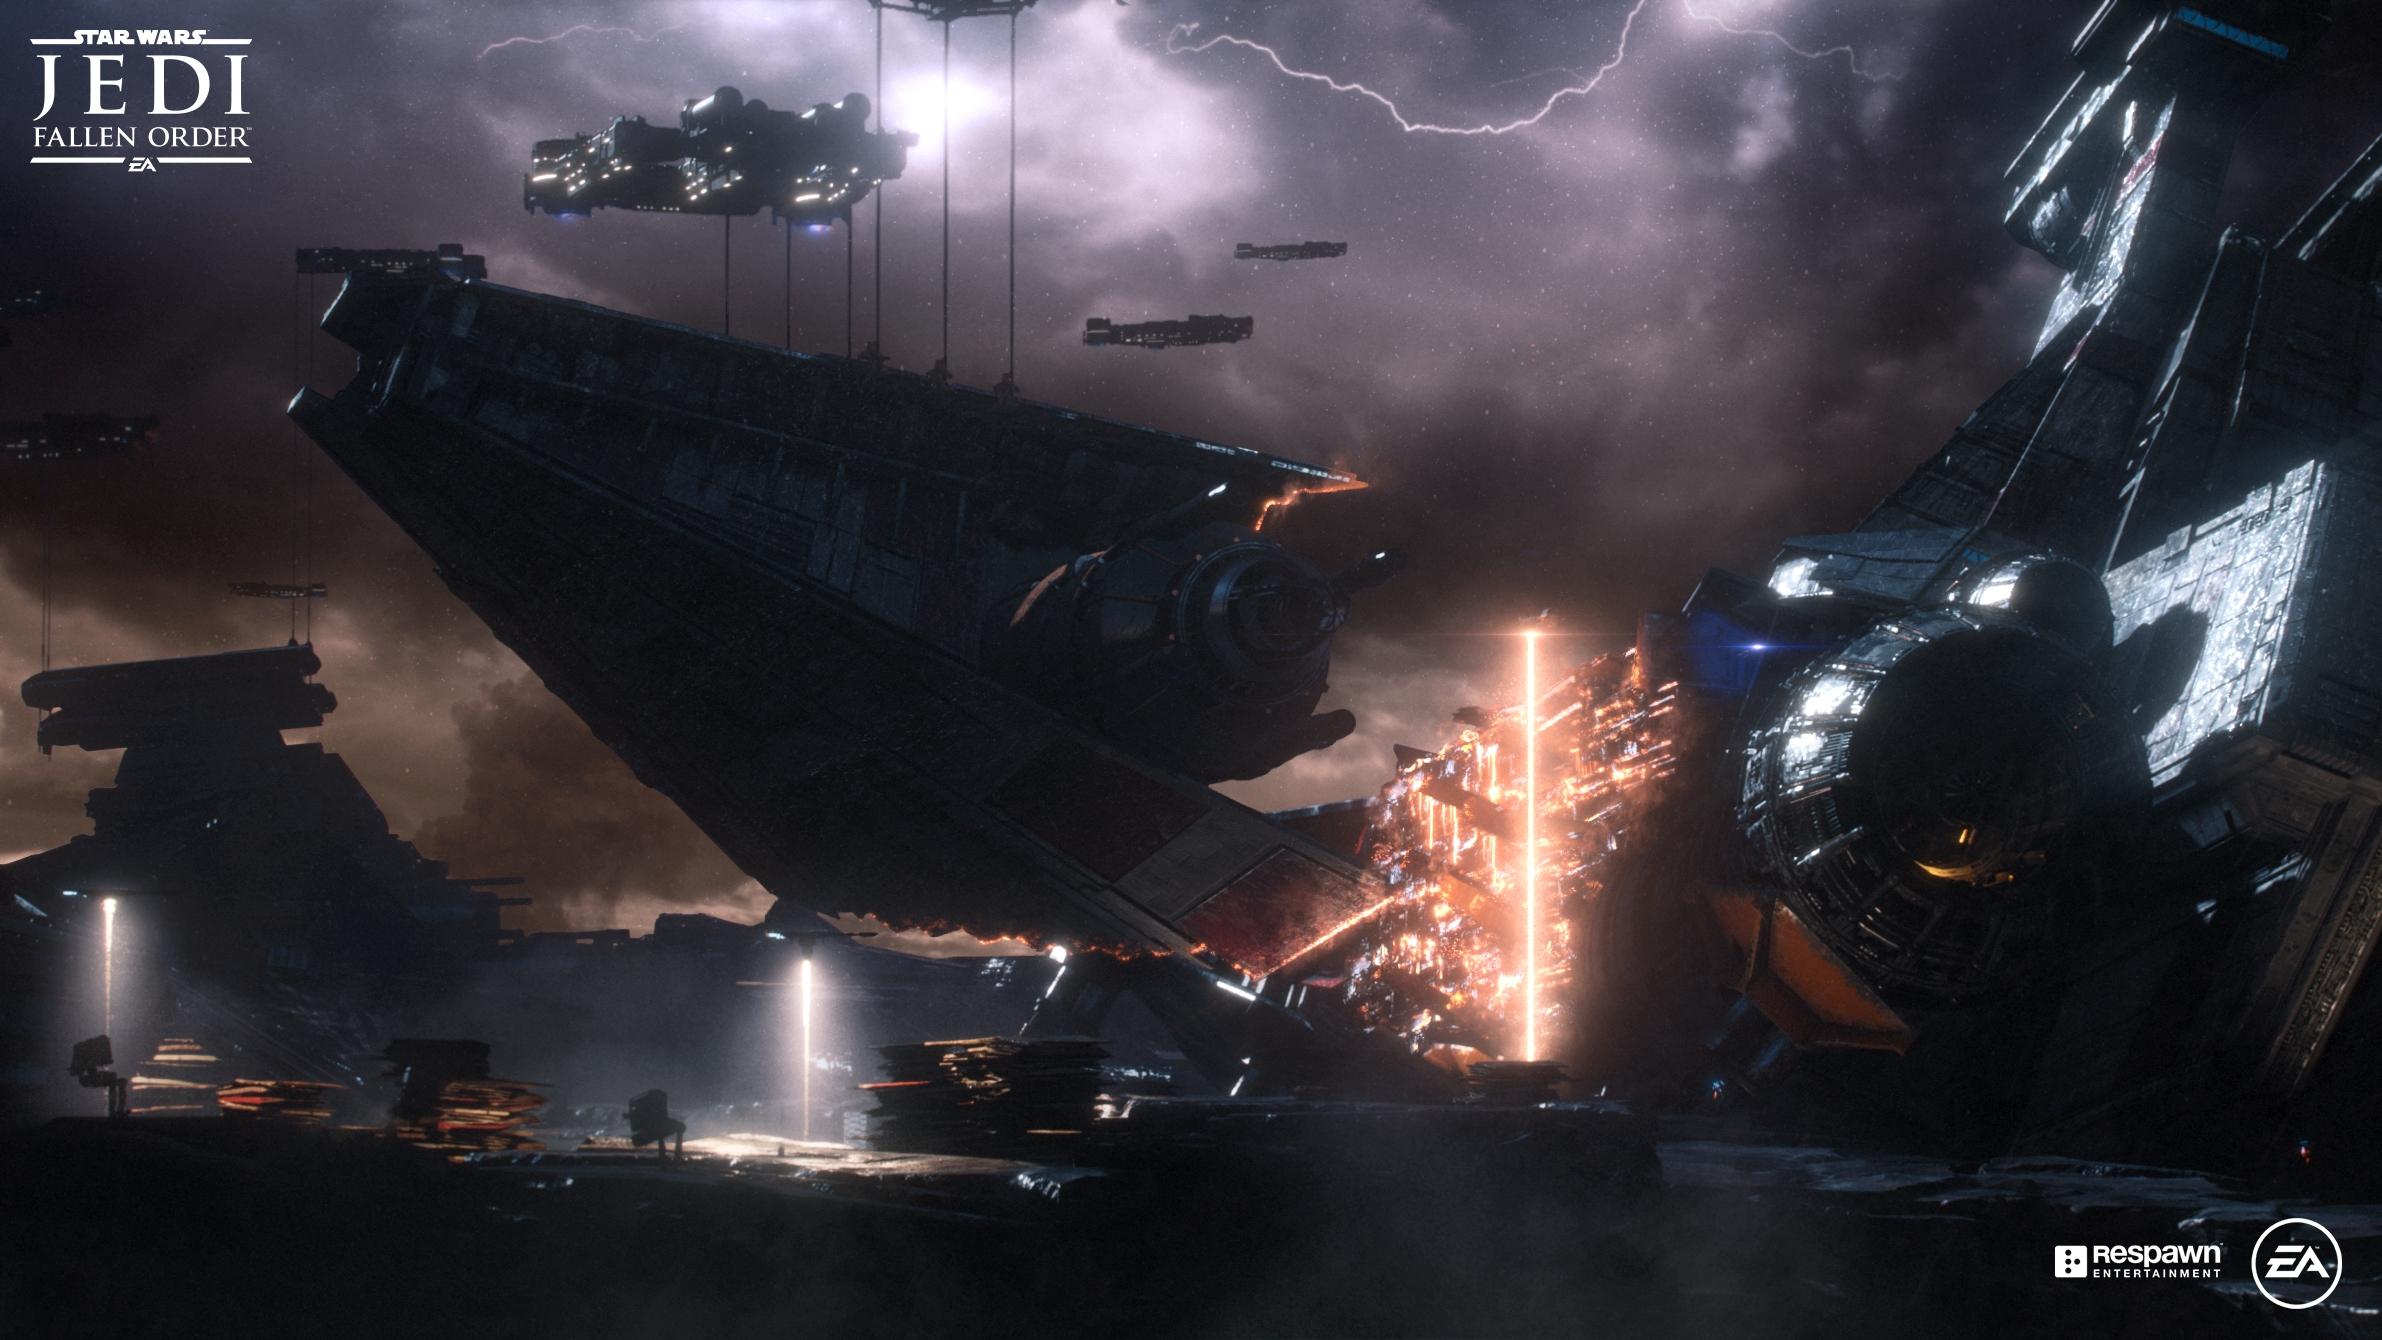 Star-Wars-Jedi-Fallen-Order_2019_04-13-19_002